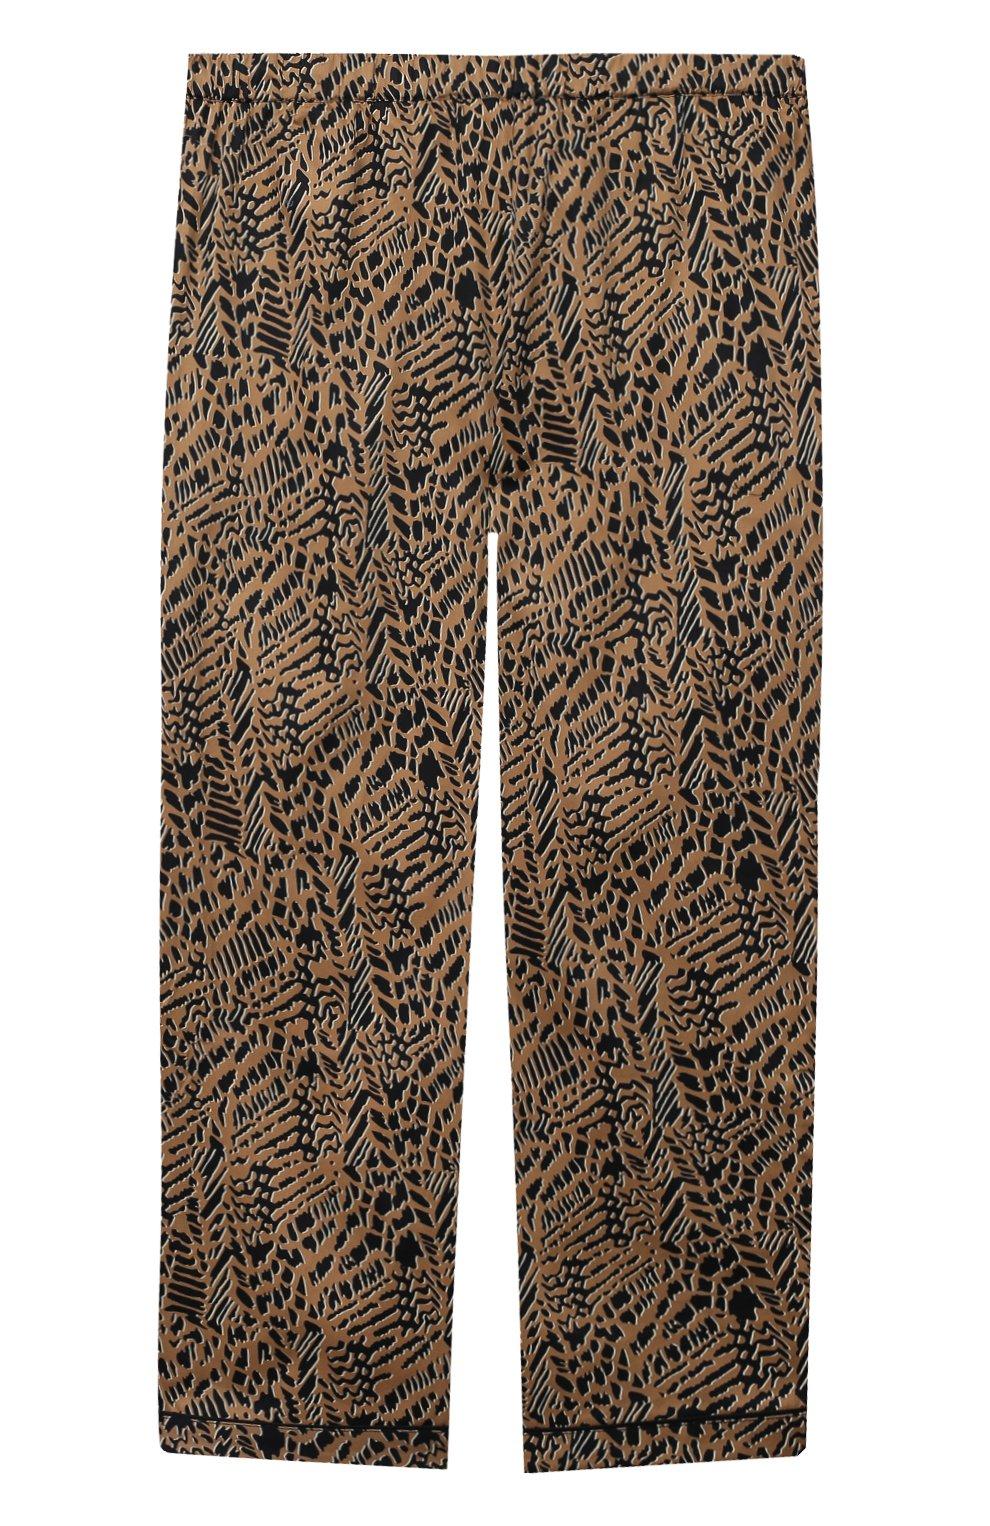 Детская хлопковая пижама LITTLE YOLKE леопардового цвета, арт. SS21-12C-AN-DI/9-12Y | Фото 5